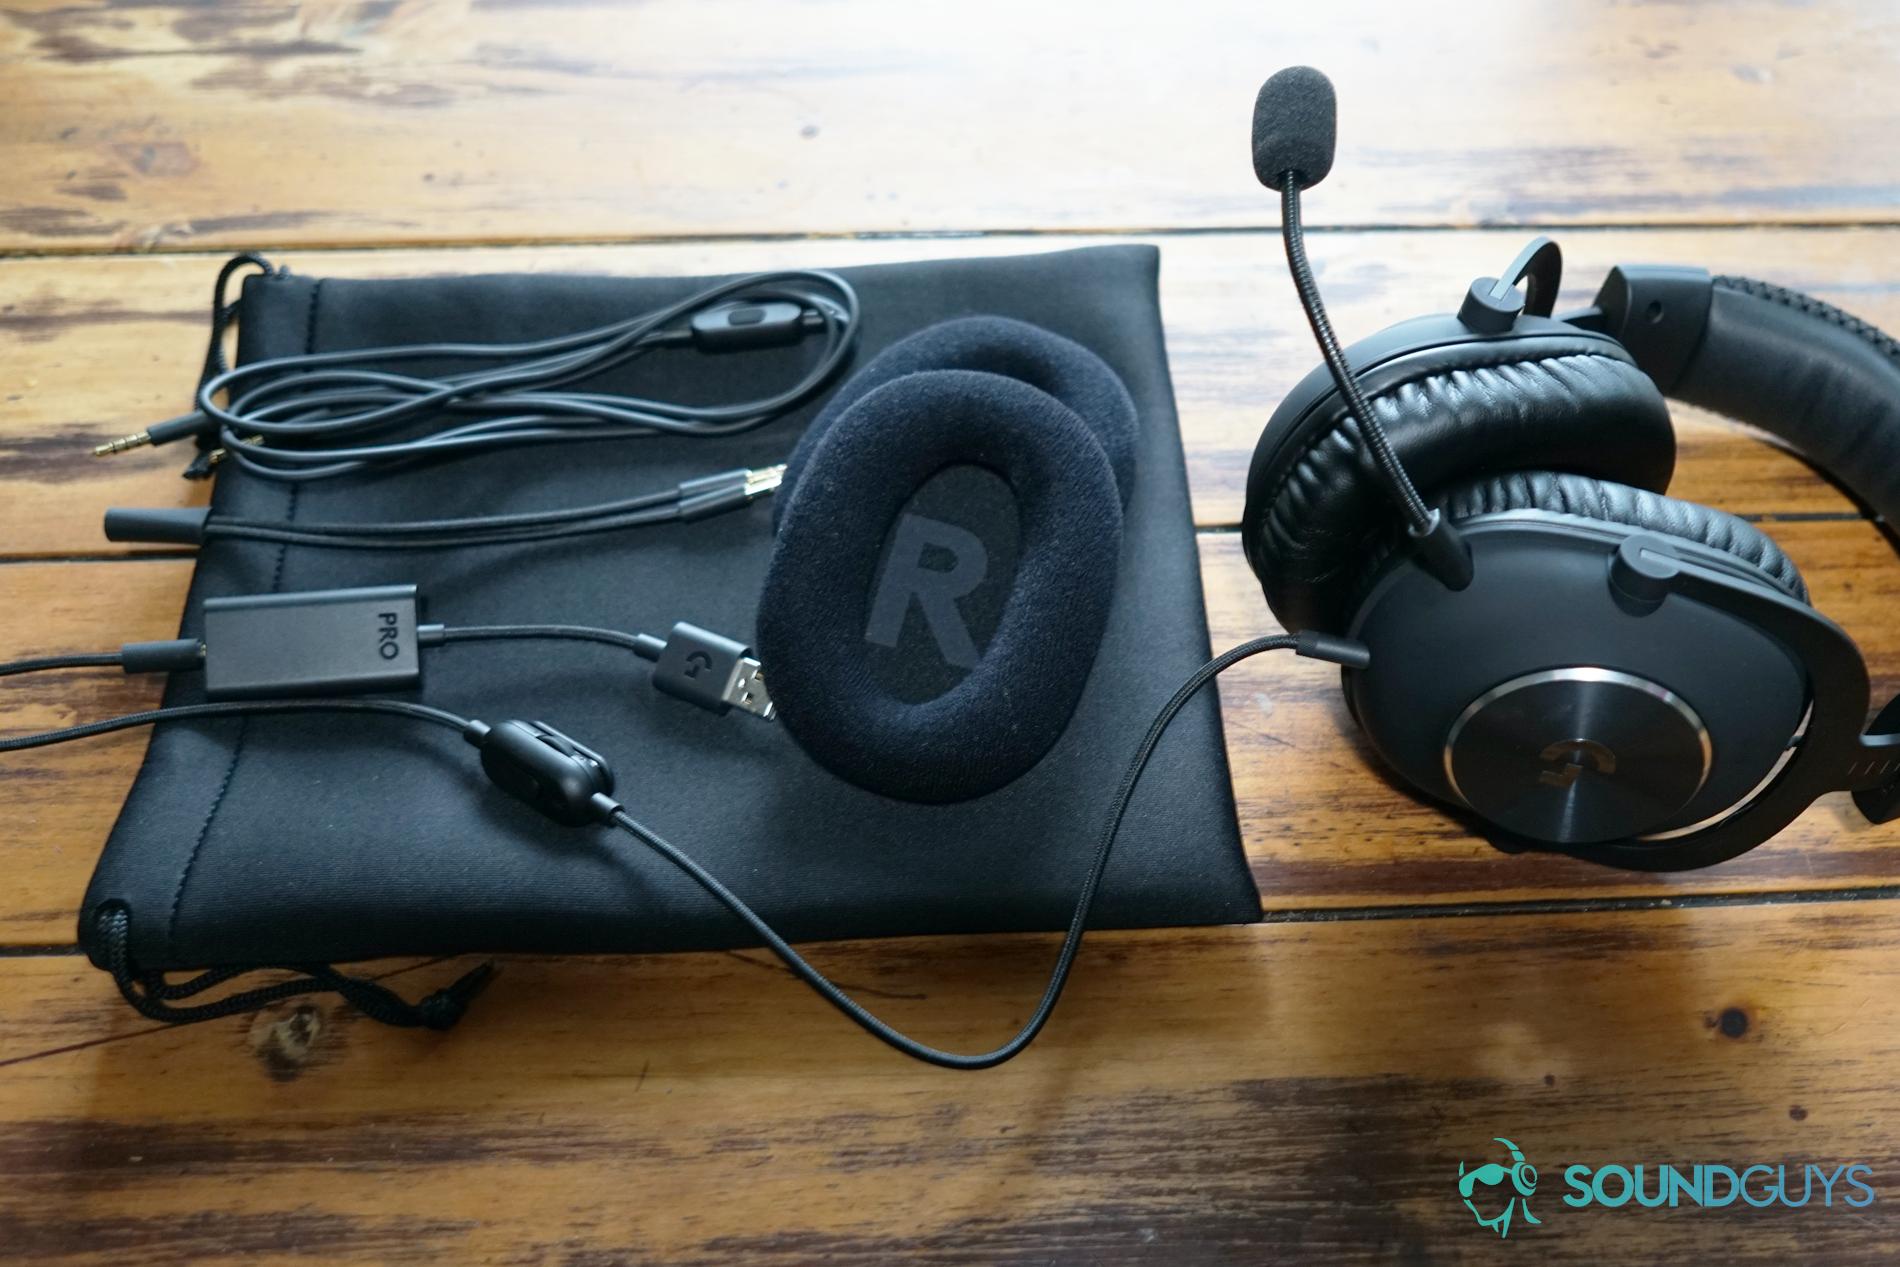 Logitech G Pro X Review Soundguys